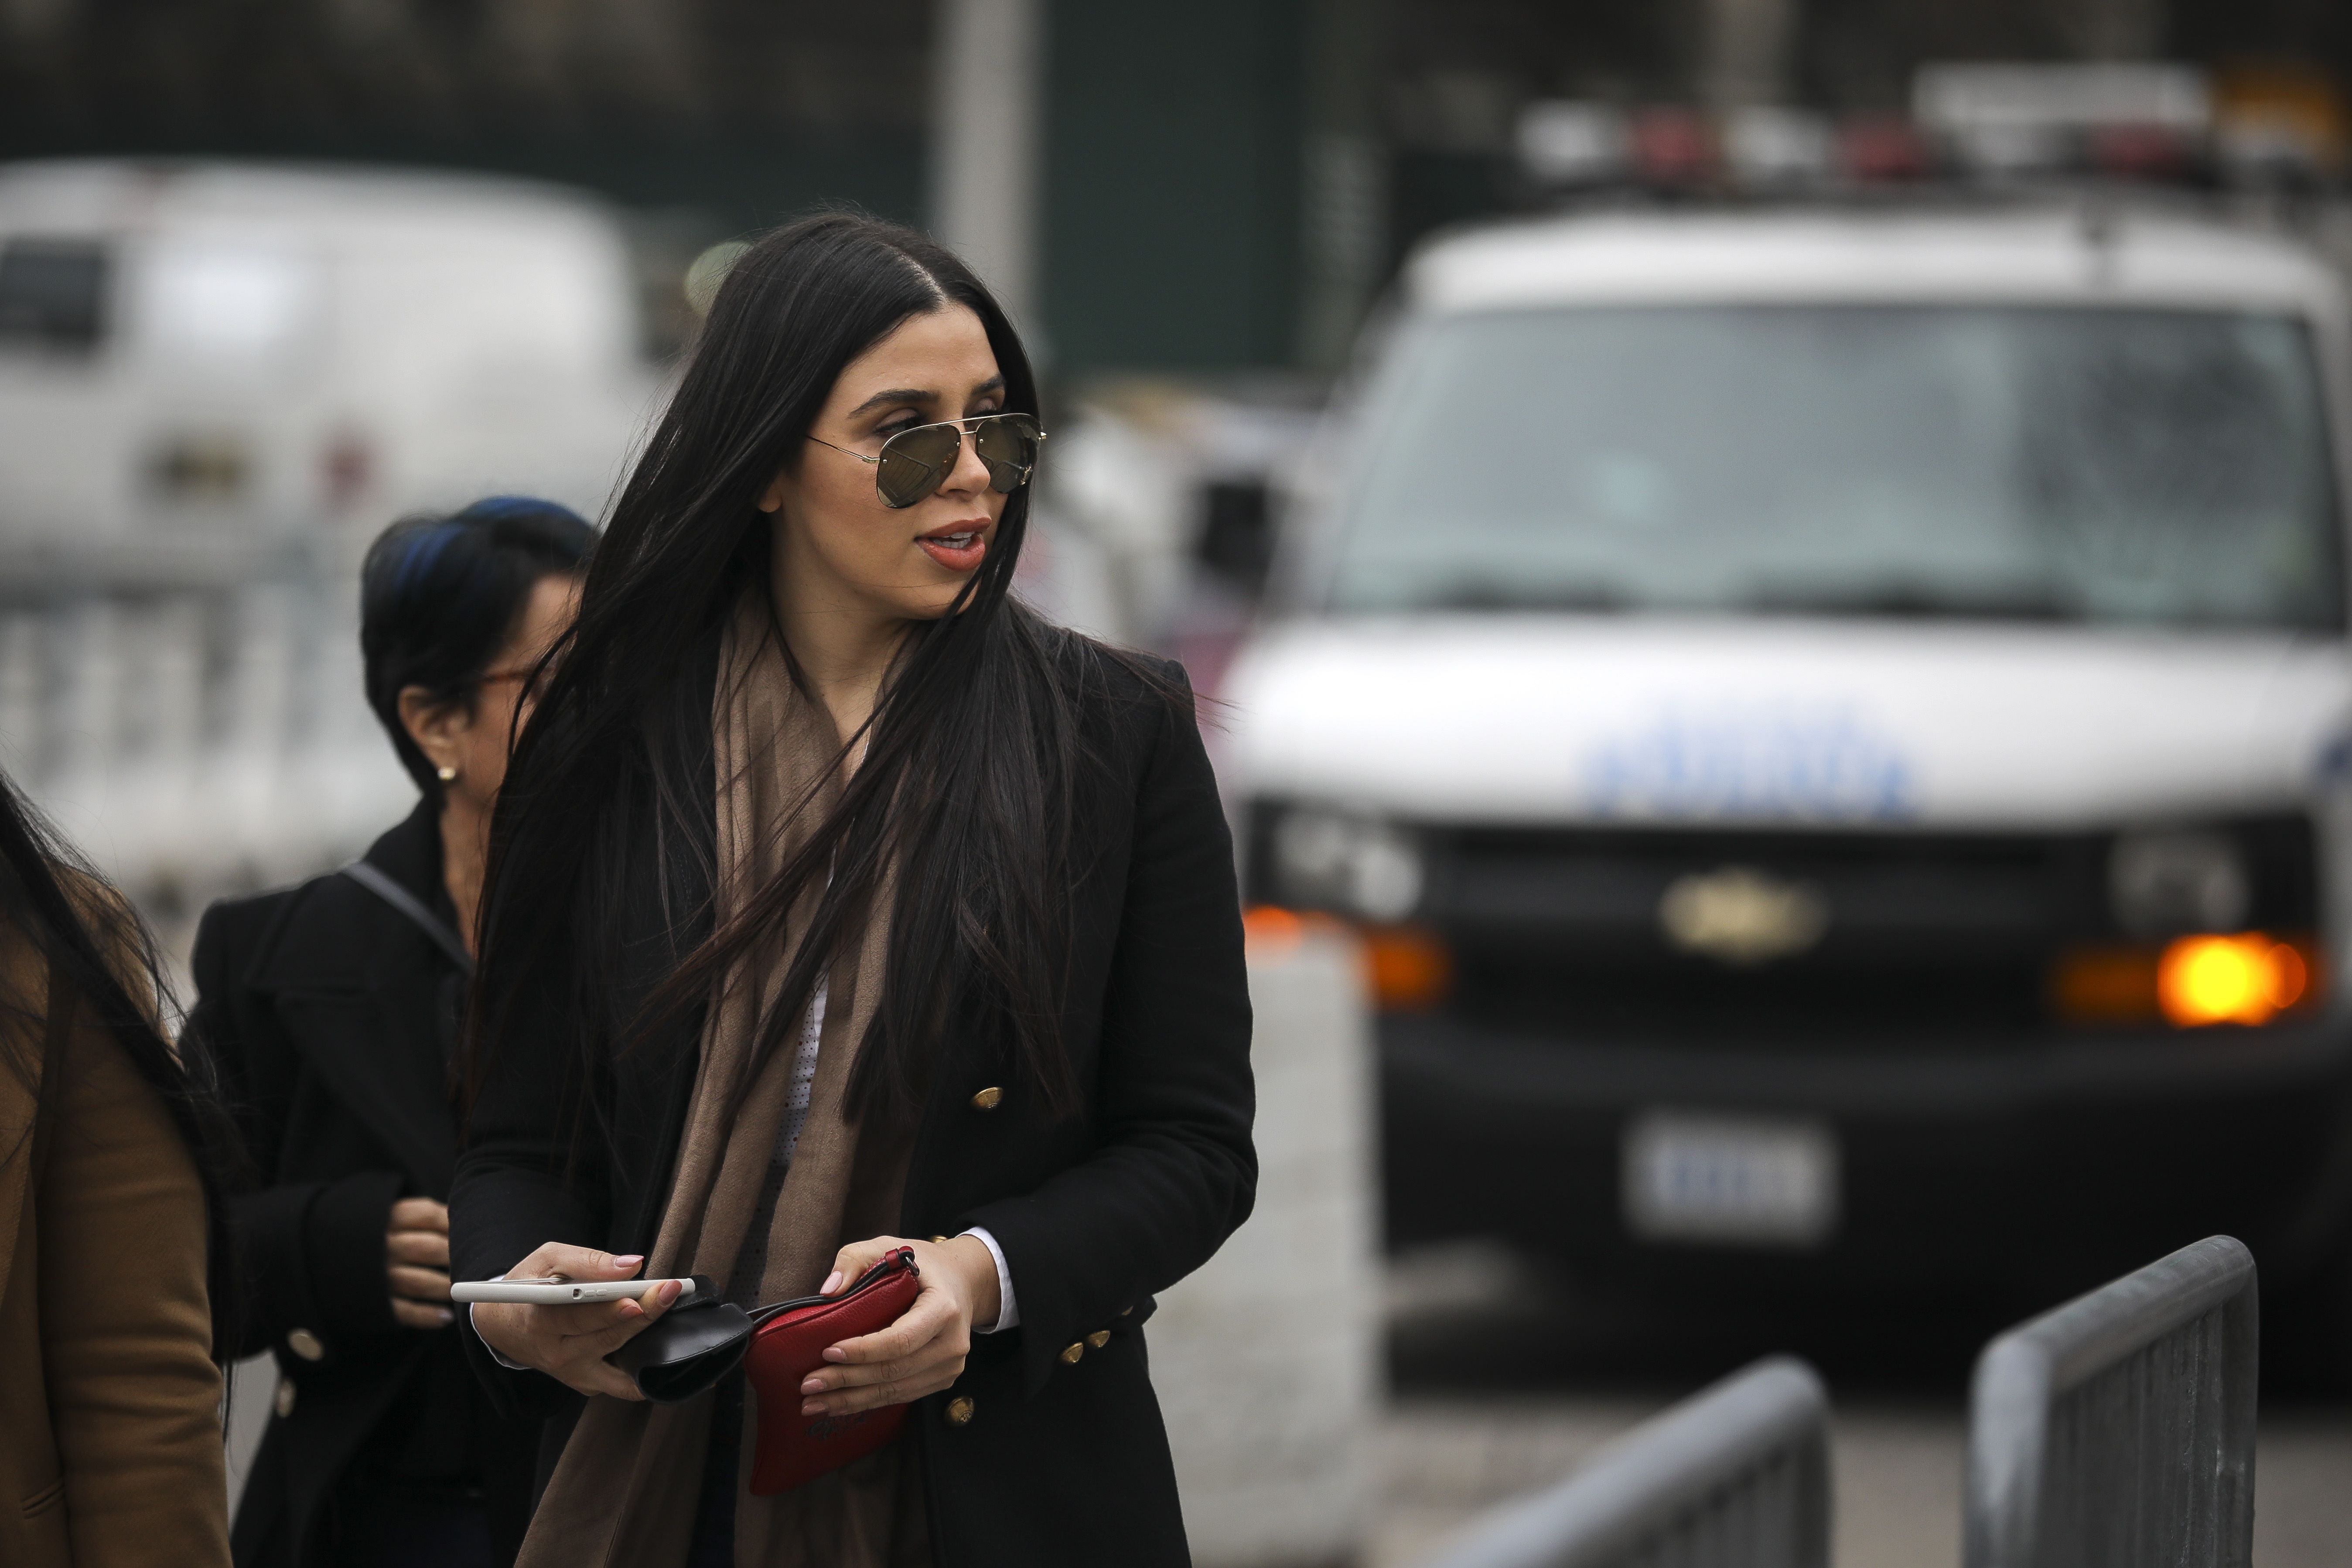 Un testigo incriminó a la esposa del Chapo, Emma Coronel, en una de sus fugas de un penal. (Foto Prensa Libre: AFP)